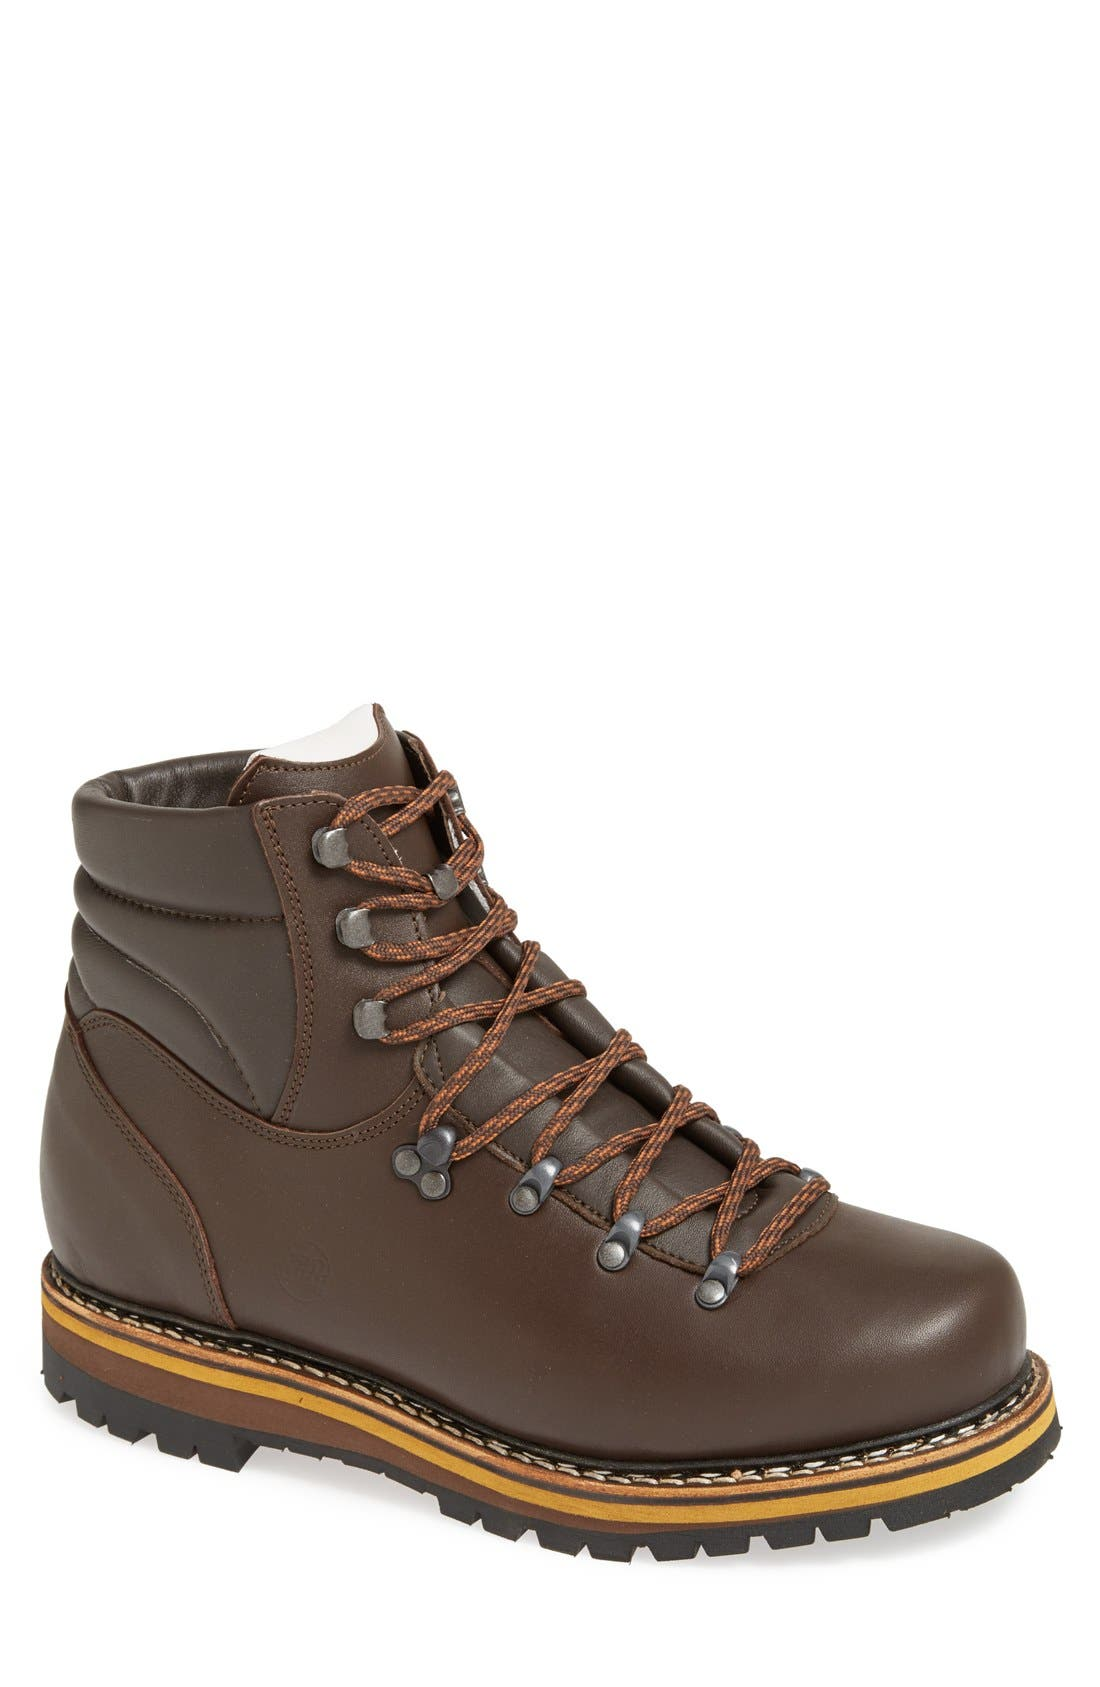 Main Image - Hanwag 'Grunten' Hiking Boot (Men)